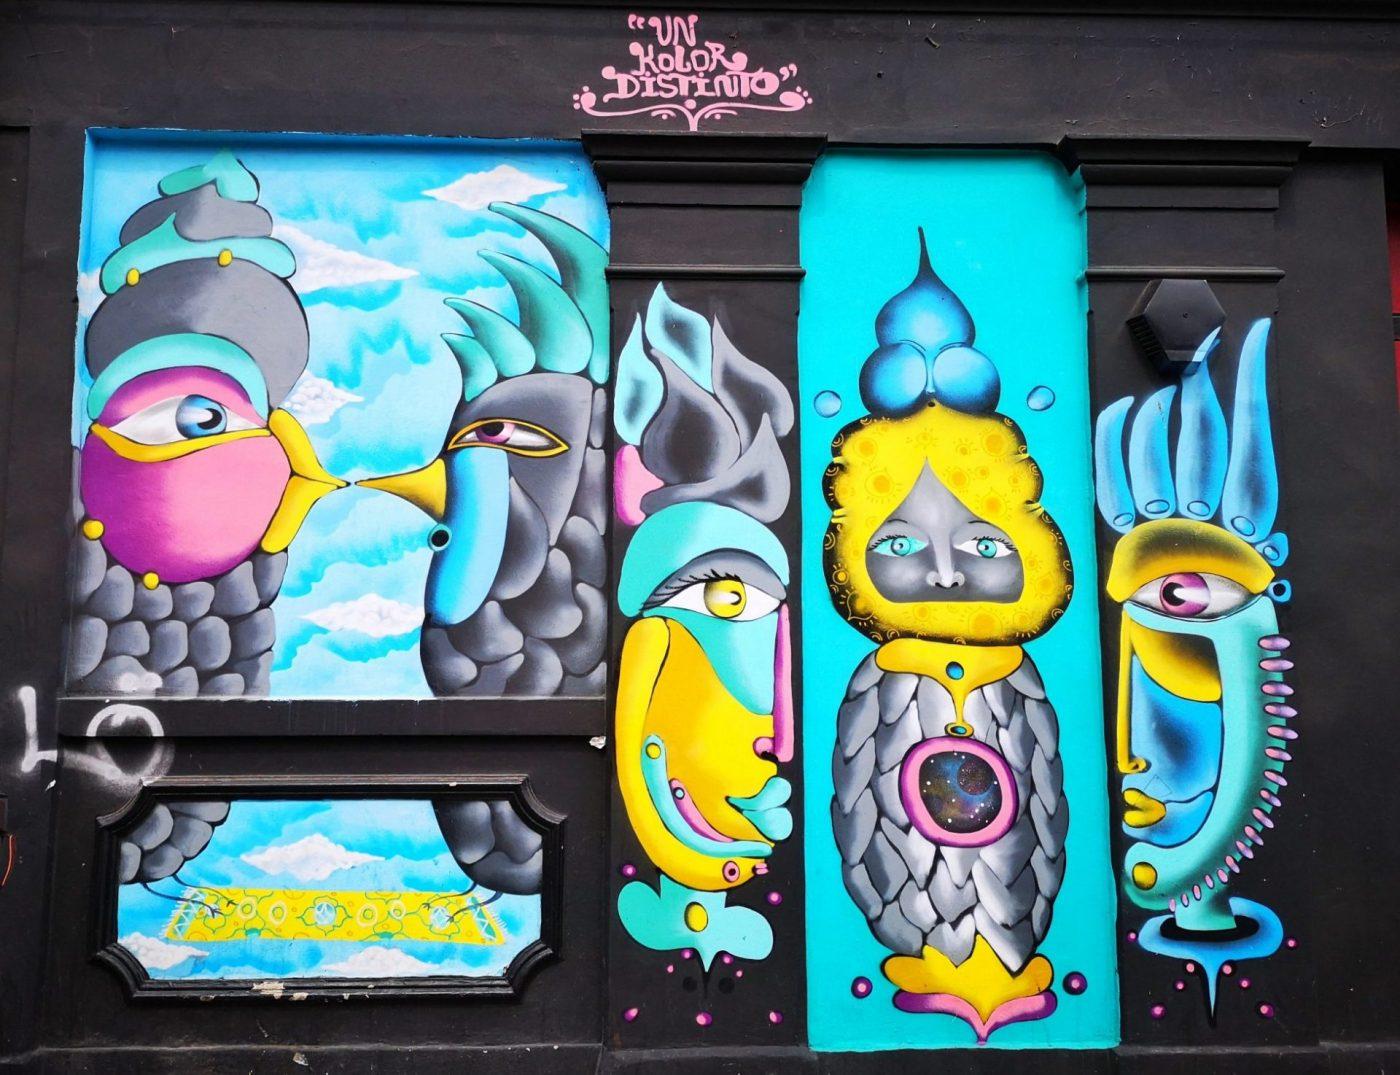 Brick Lane Street Art Tour in Shoreditch